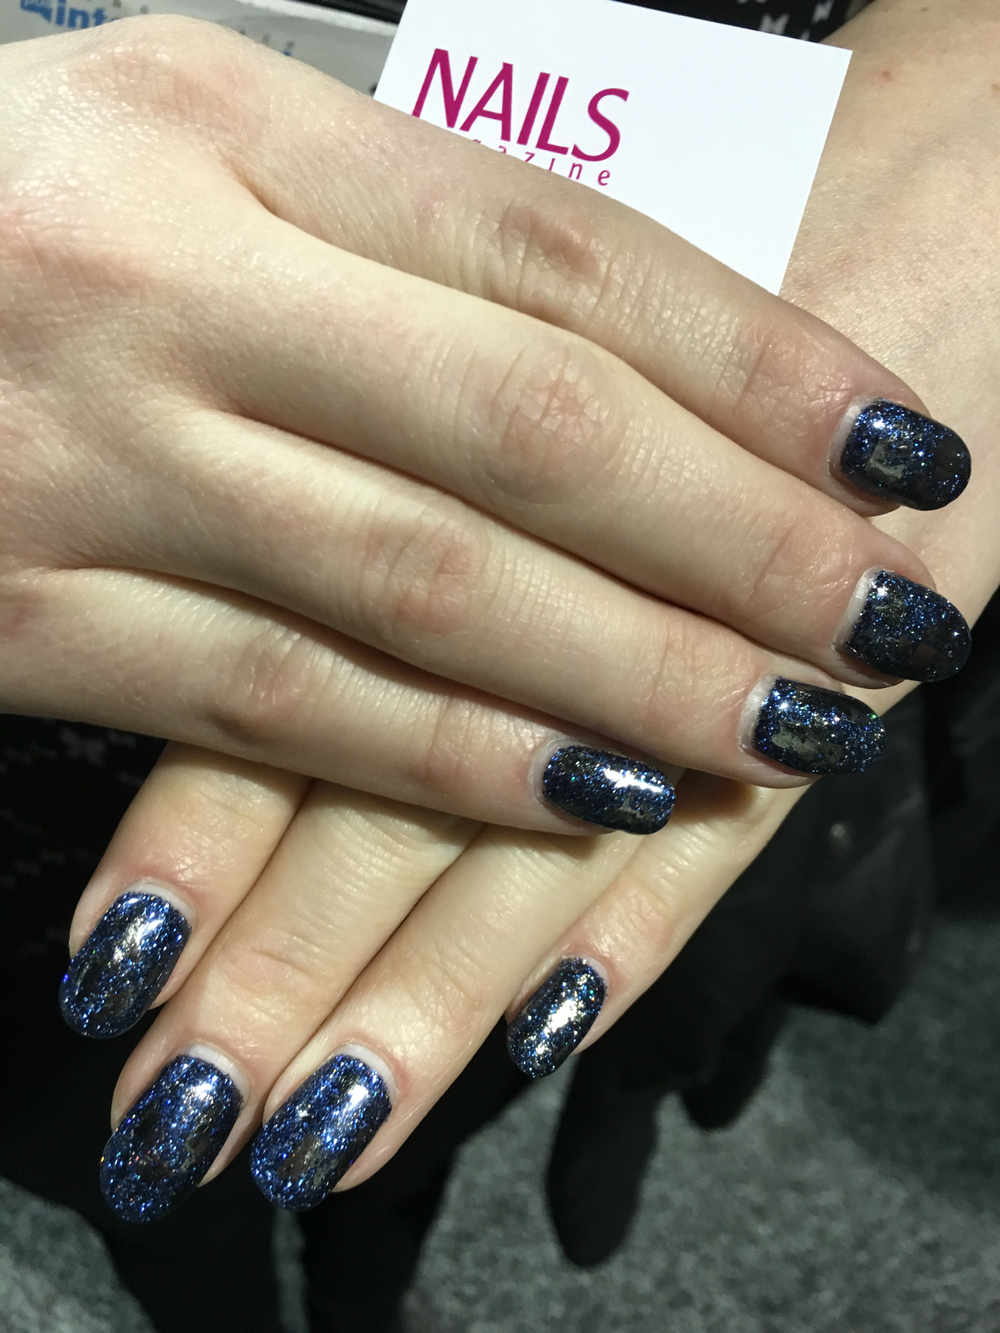 "<p><a href=""https://www.instagram.com/jewelednails/"">@jewelednails</a></p>"